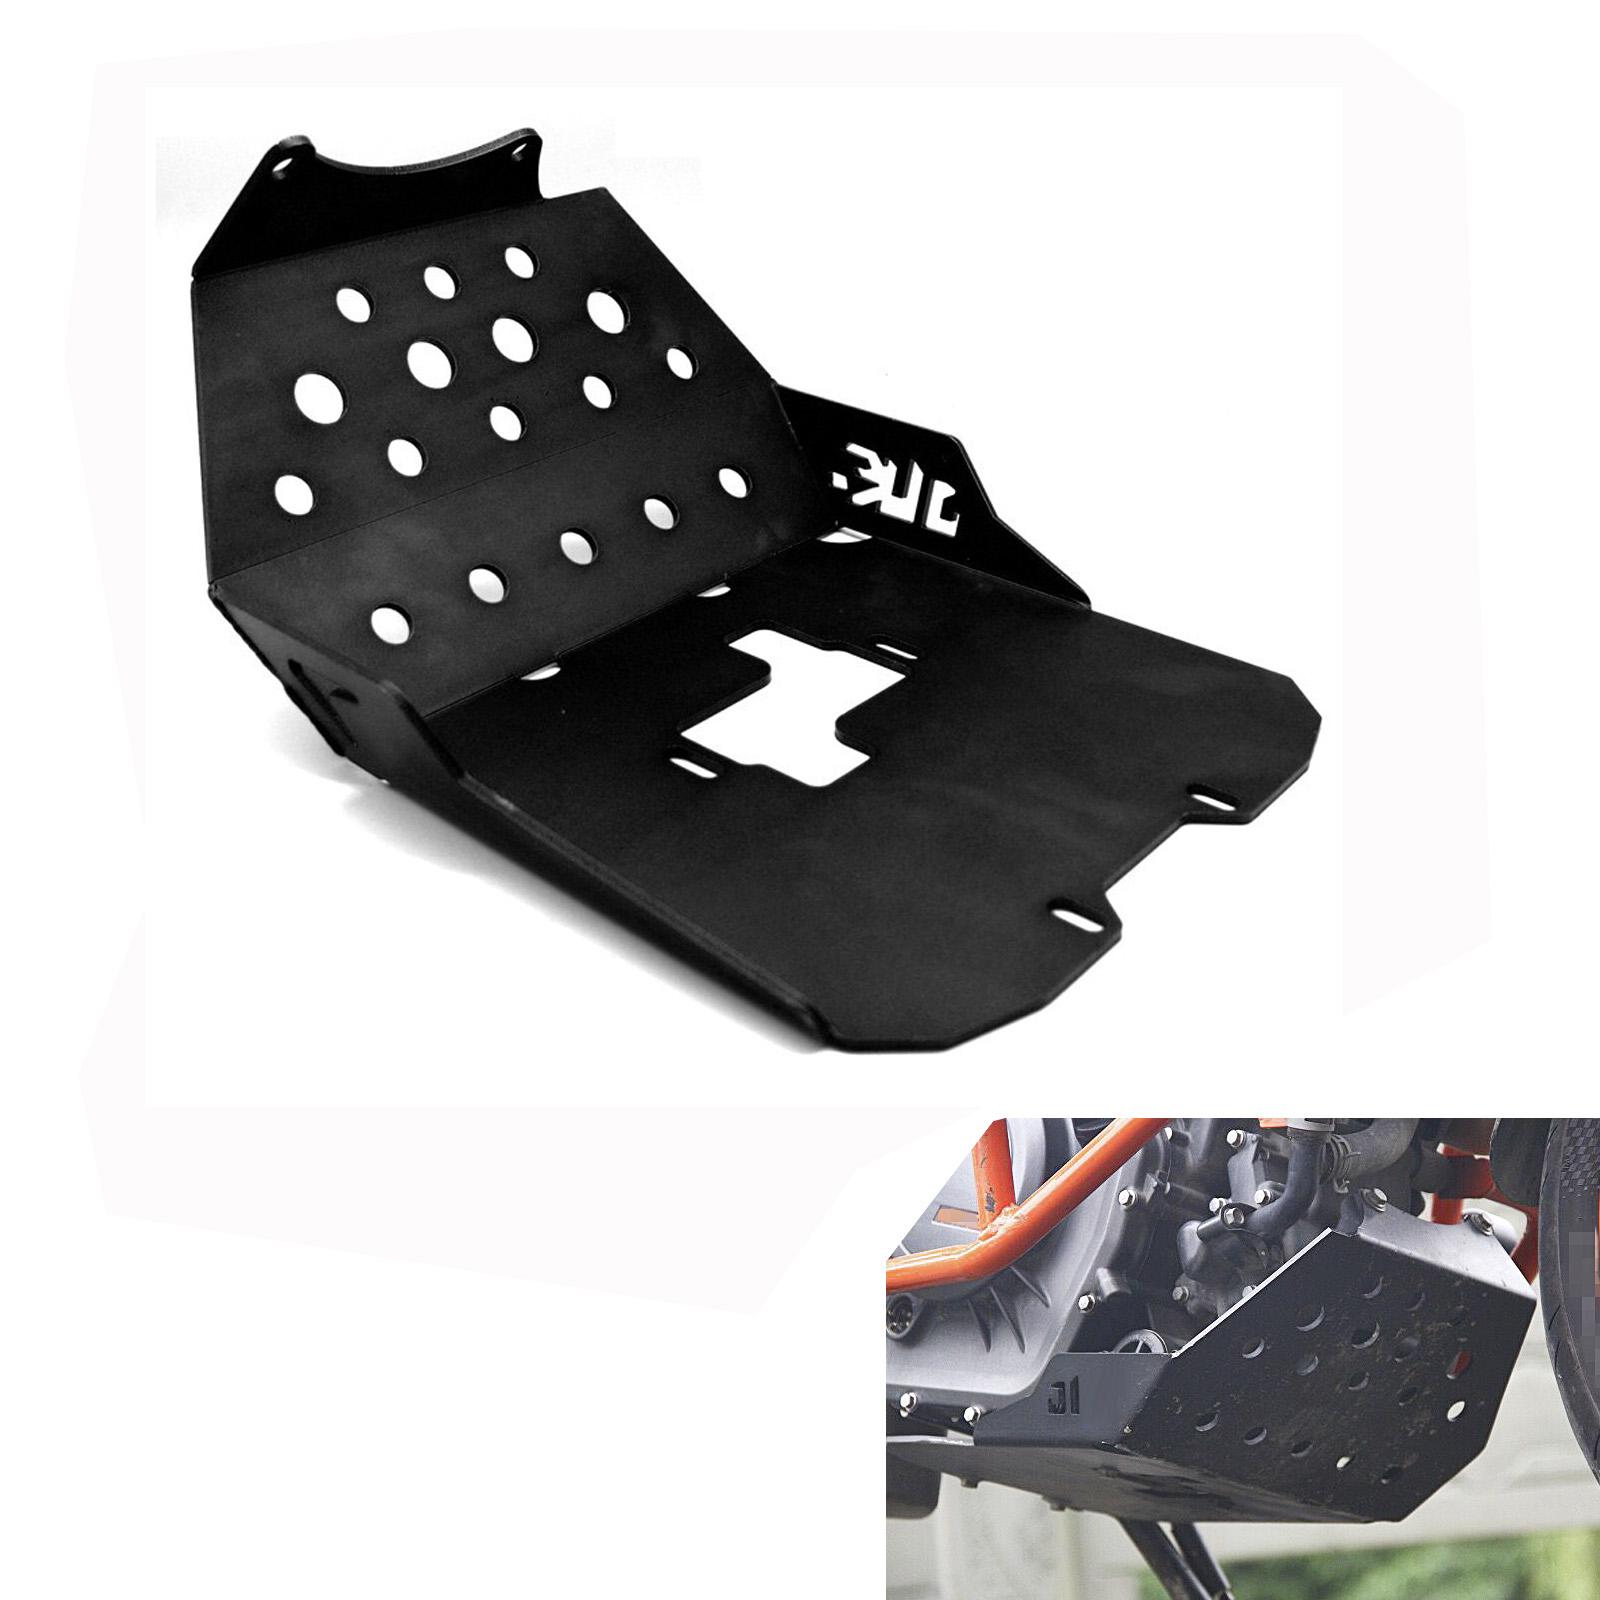 Aluminum Motorcycle Engine Guard Protector Skid Plate For KTM DUKE 390 13-16 black